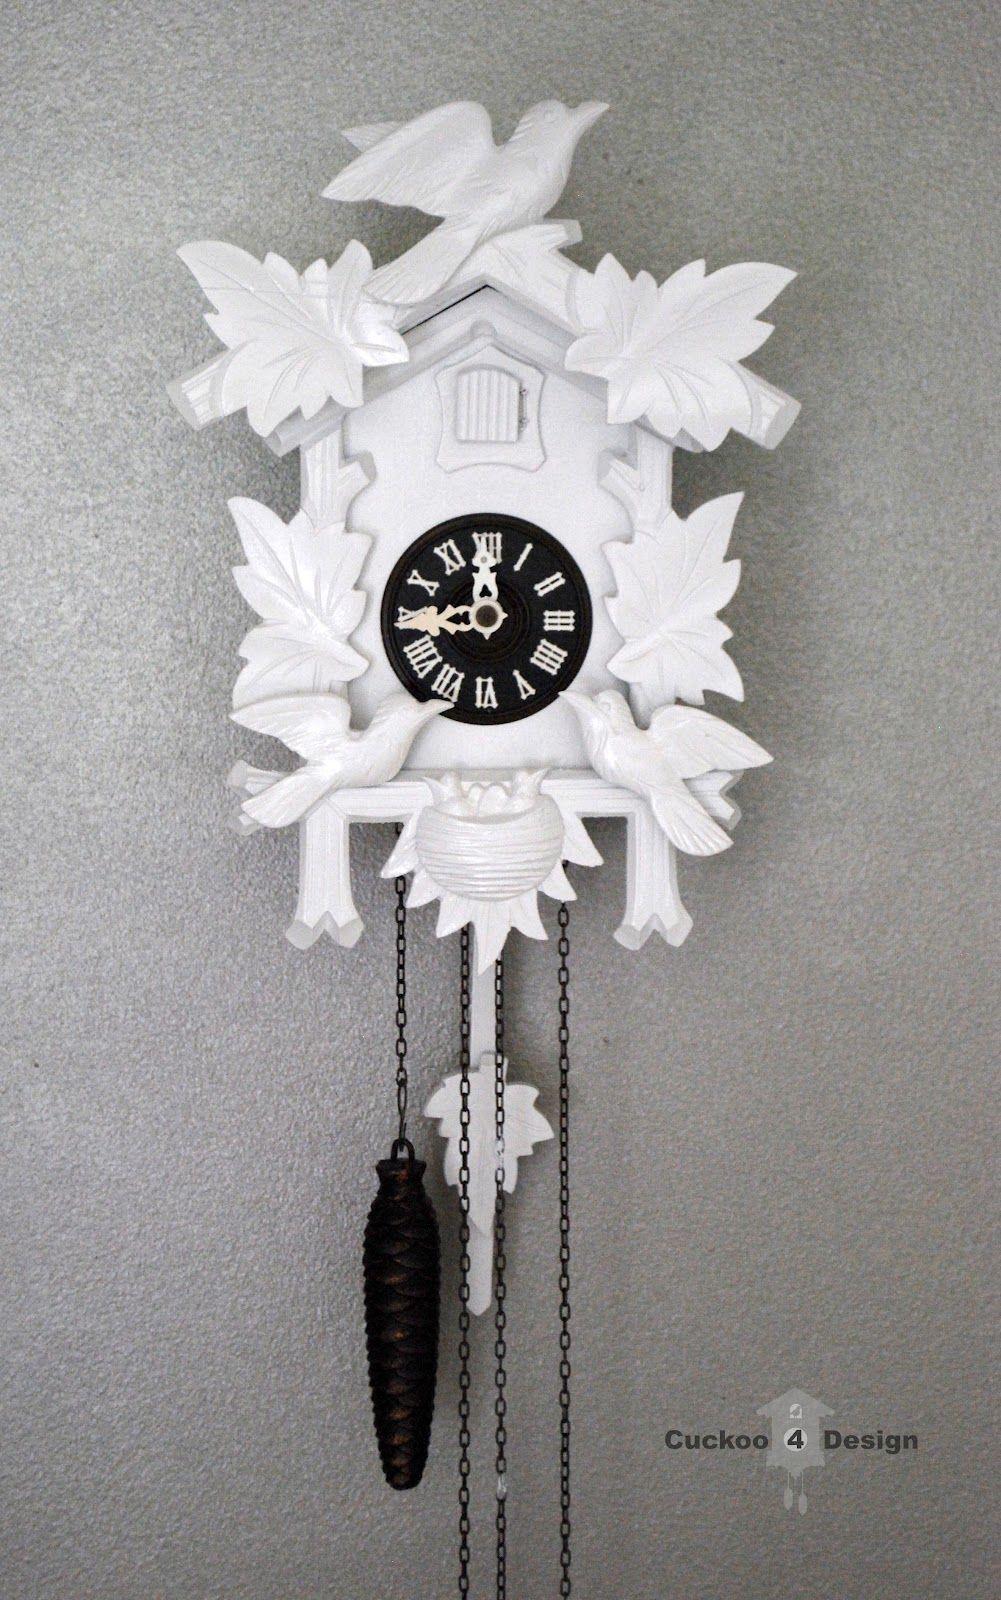 Painted Cuckoo Clocks Cuckoo Clock Clock Cuckoo